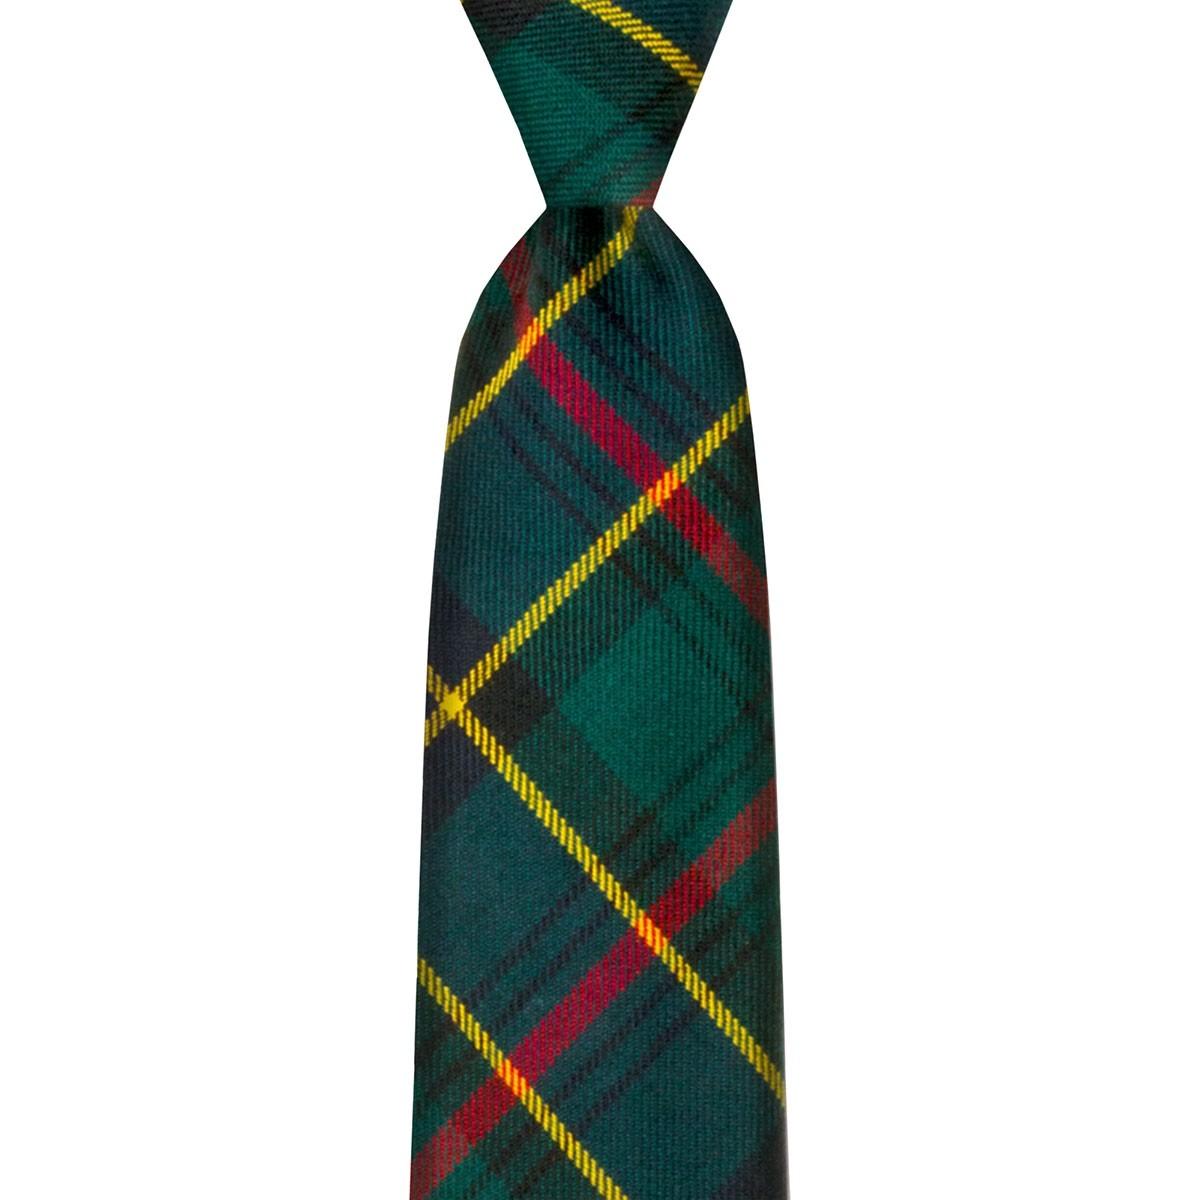 Ogilvie Hunting Modern Tartan Tie